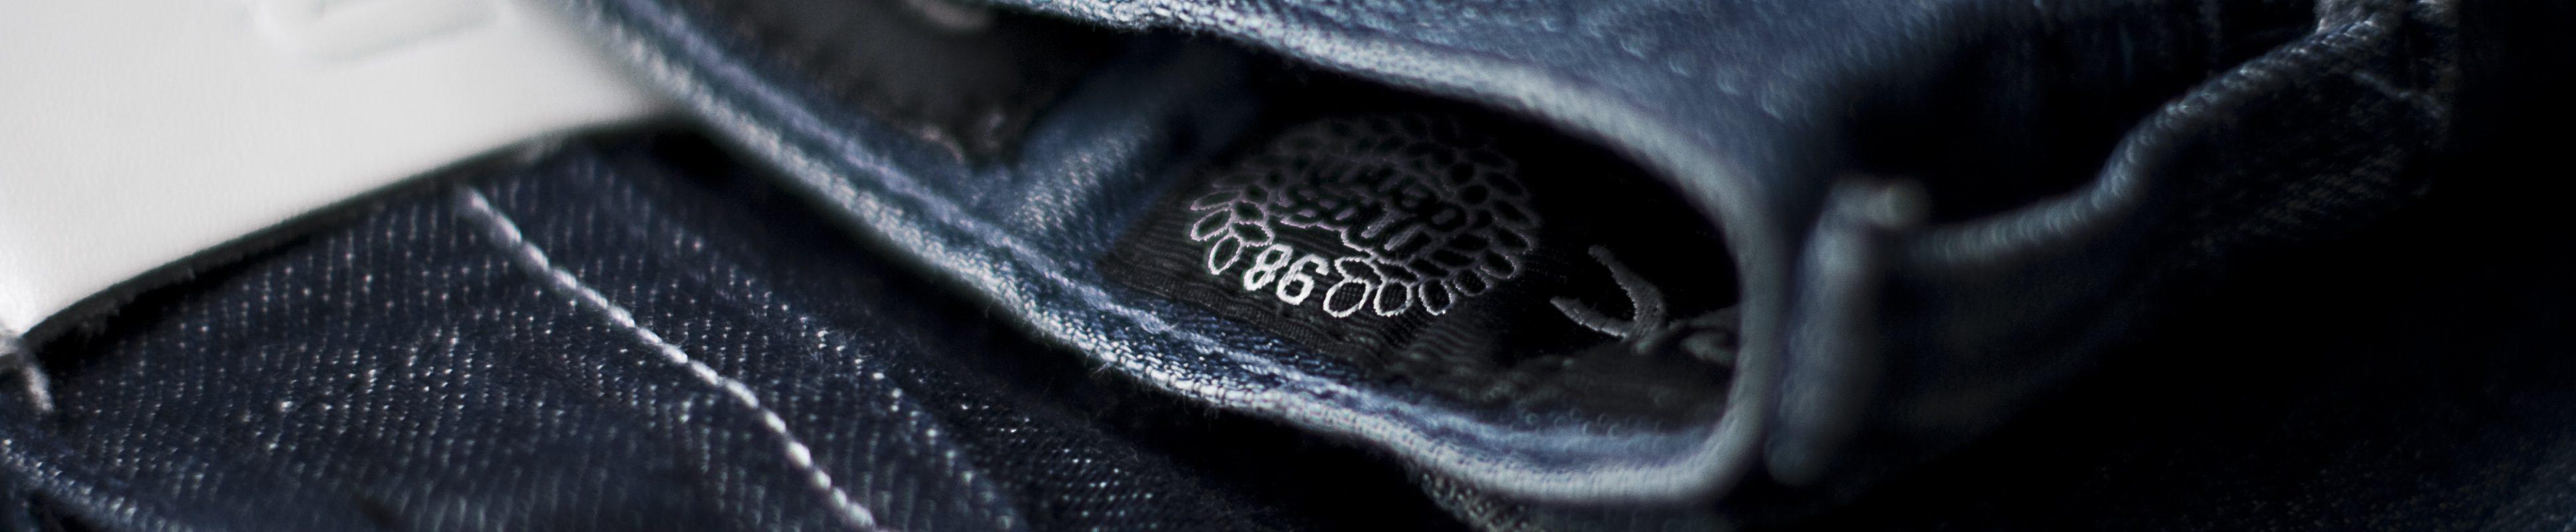 historia do jeans